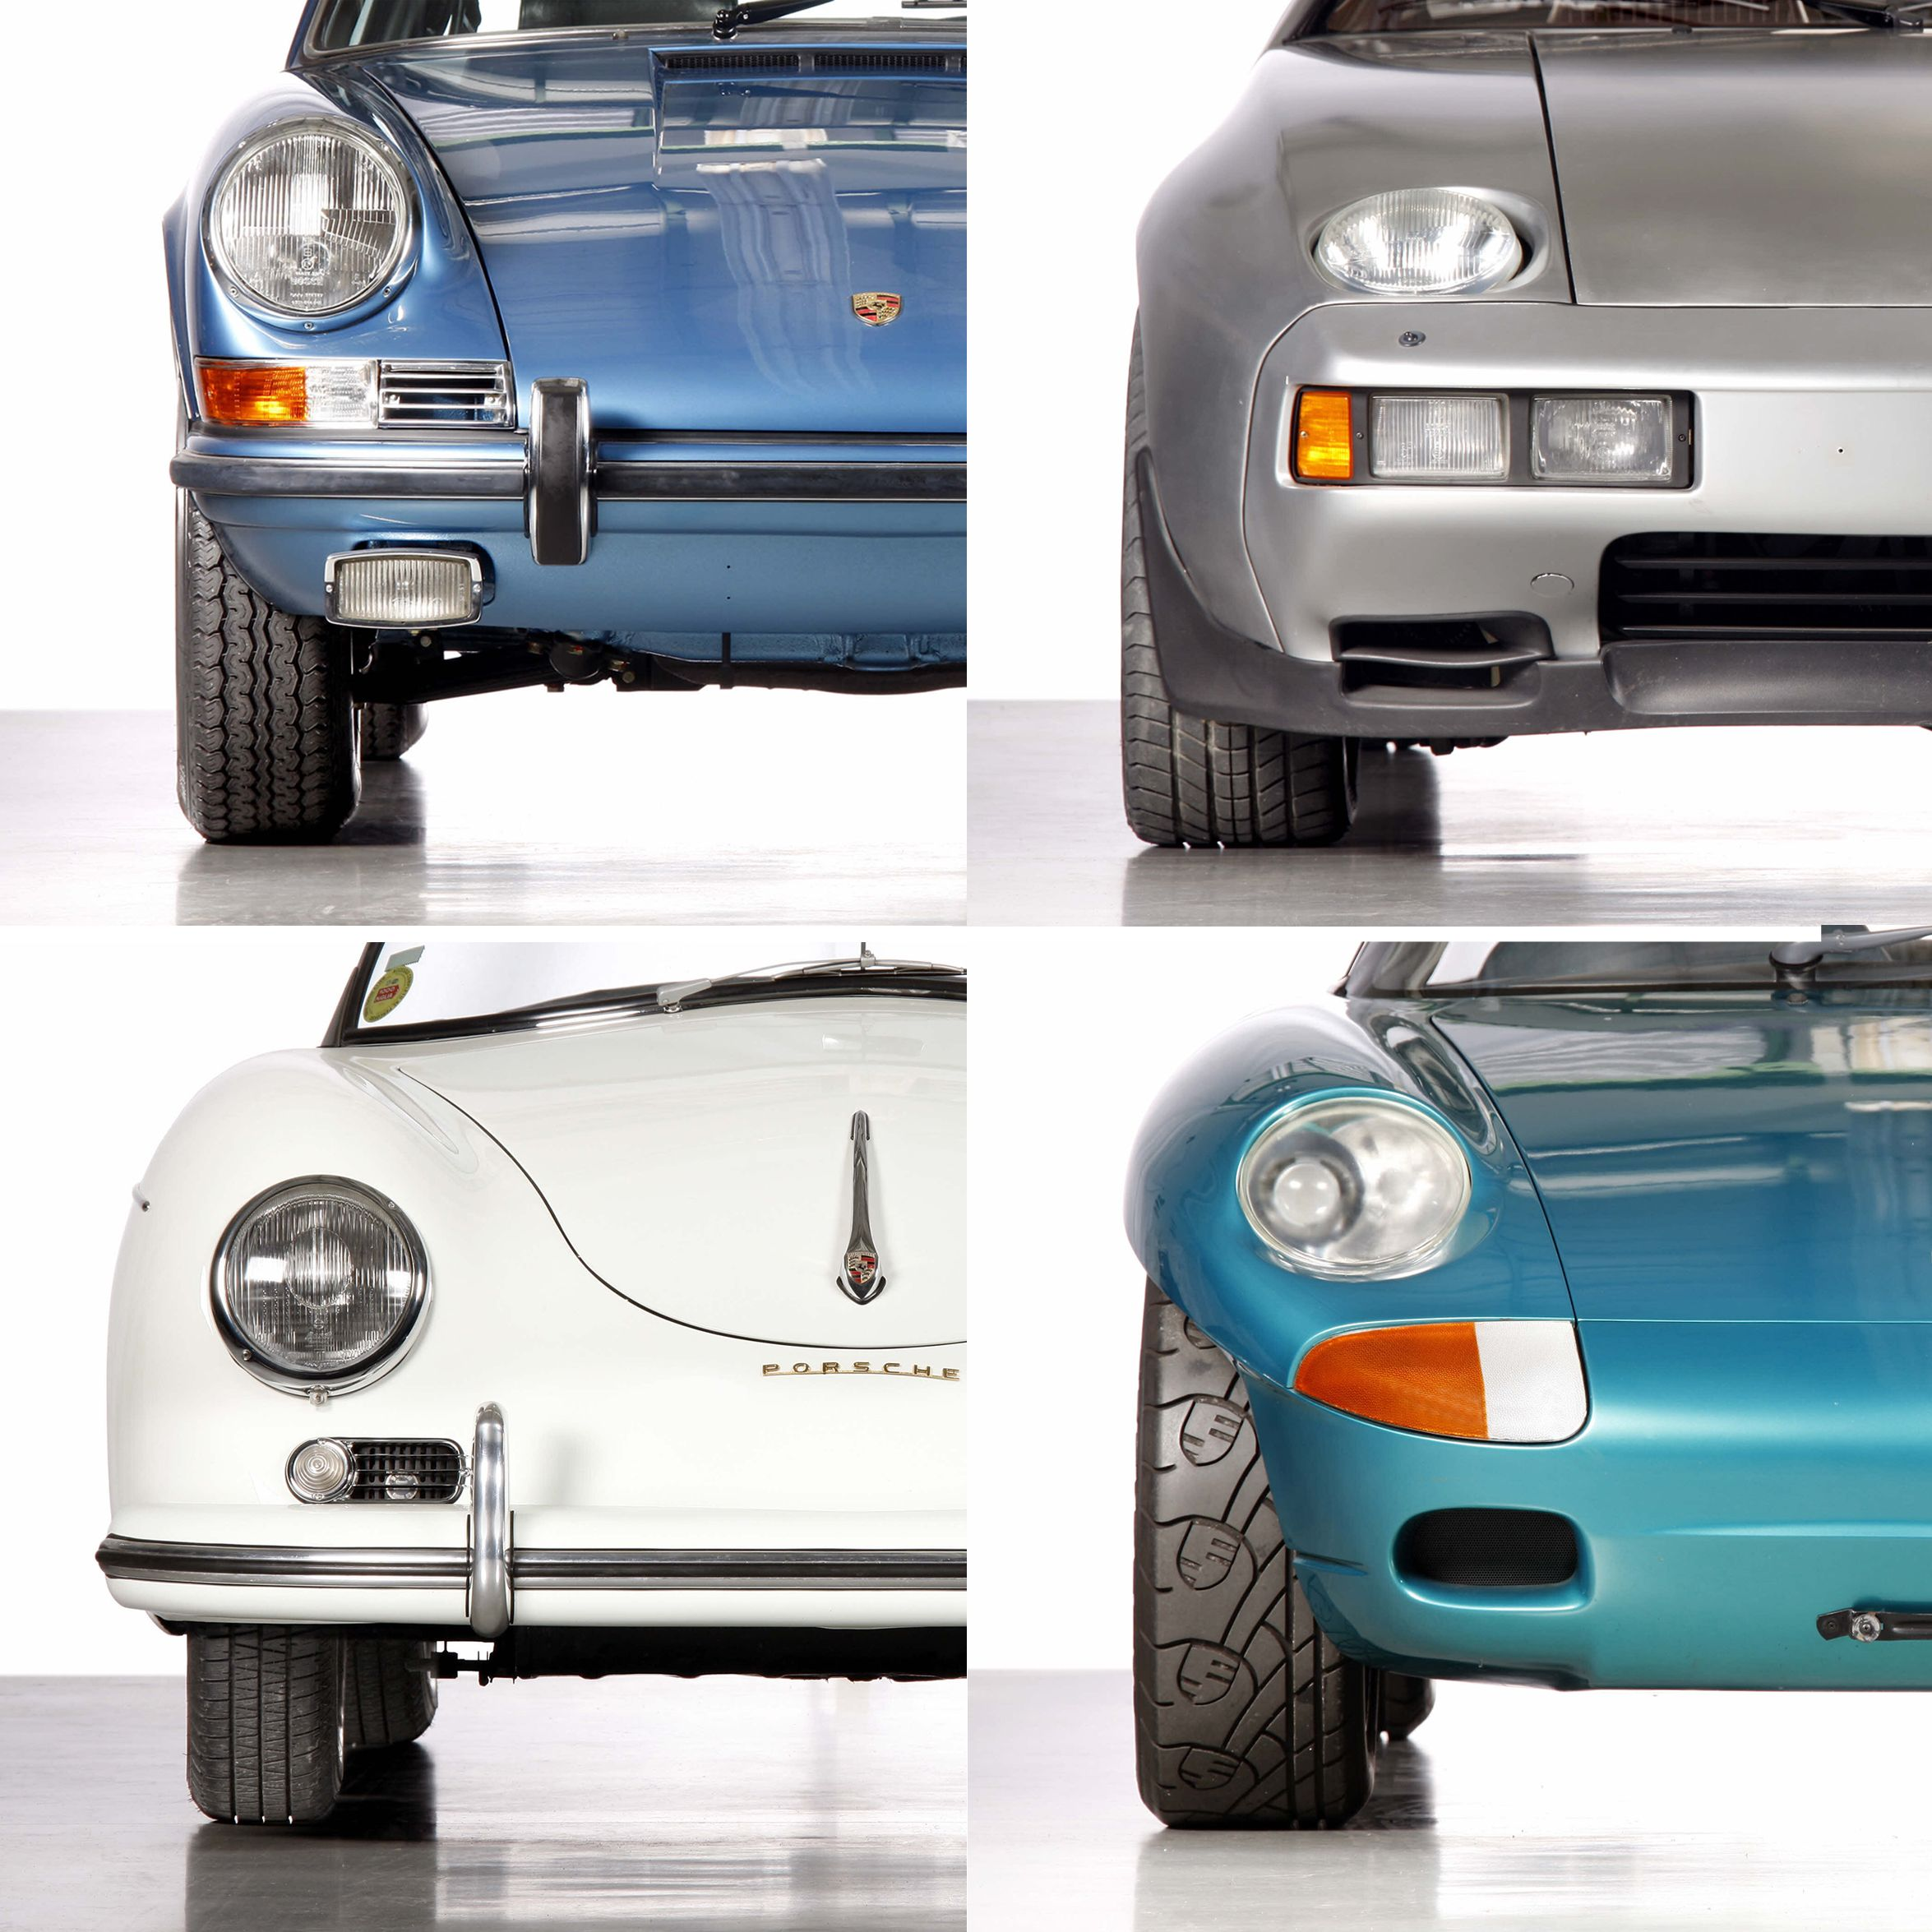 Luxury Cars Porsche Cars Black Porsche: Porsche, Gt Cars, Vintage Porsche